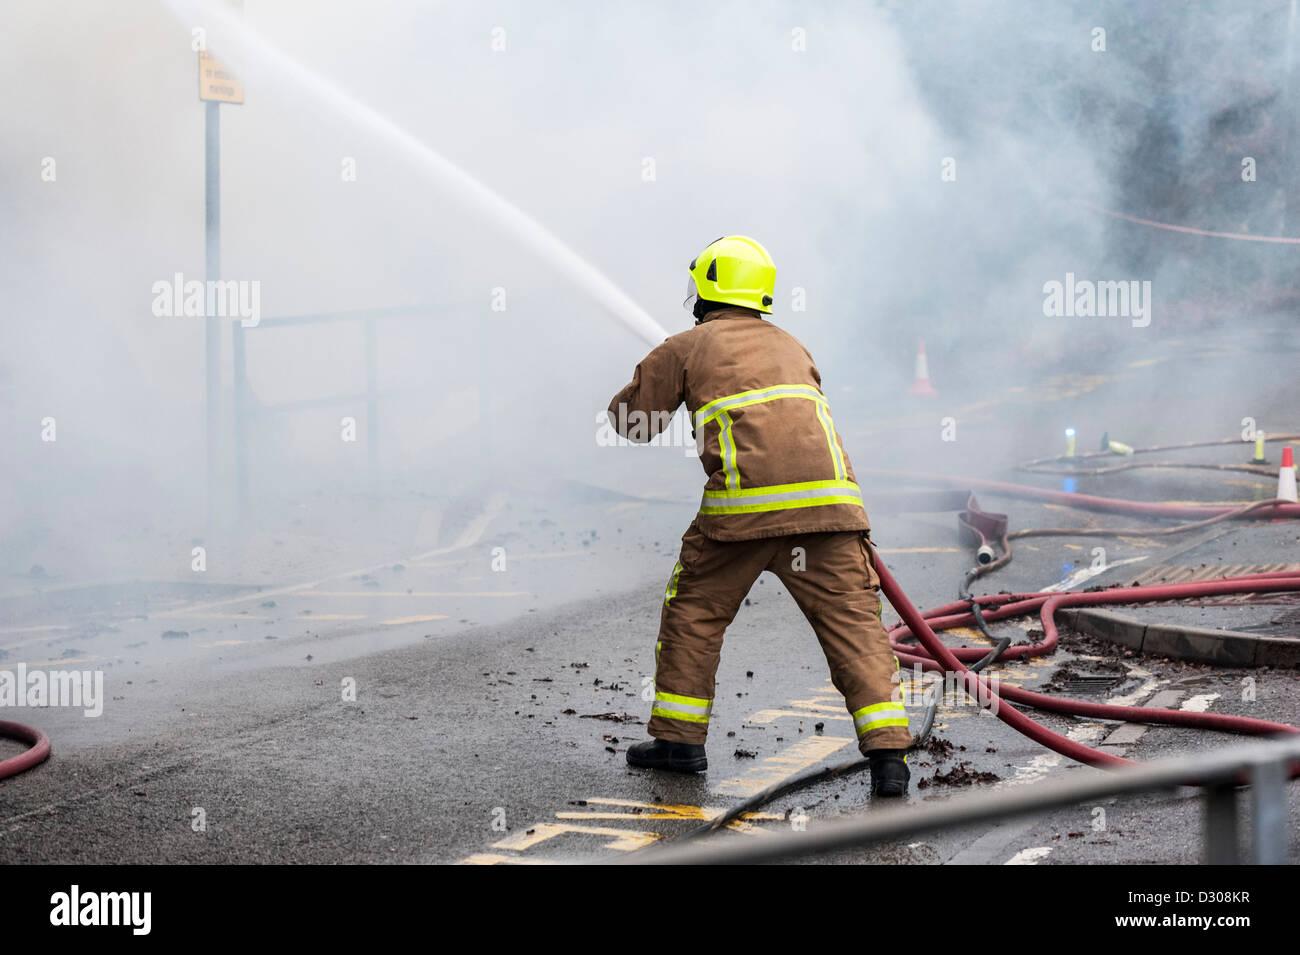 Fireman tackle a blaze in England, UK - Stock Image